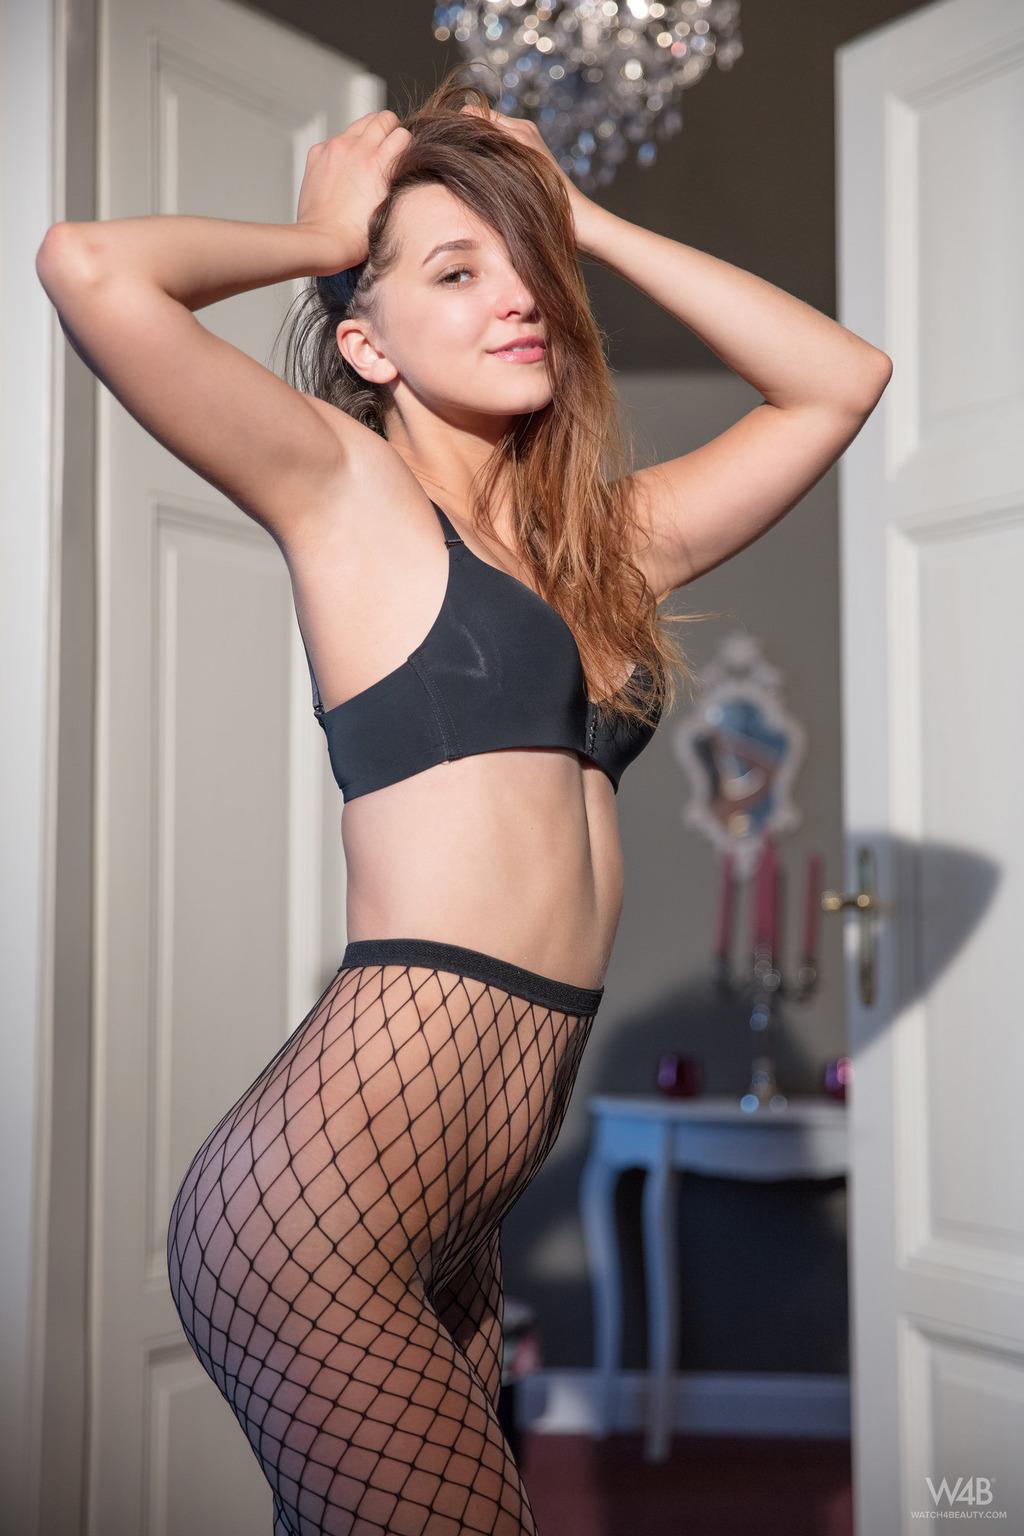 PHOTO | 00 236 - Cute Teen Milana In Sexy Fishnet